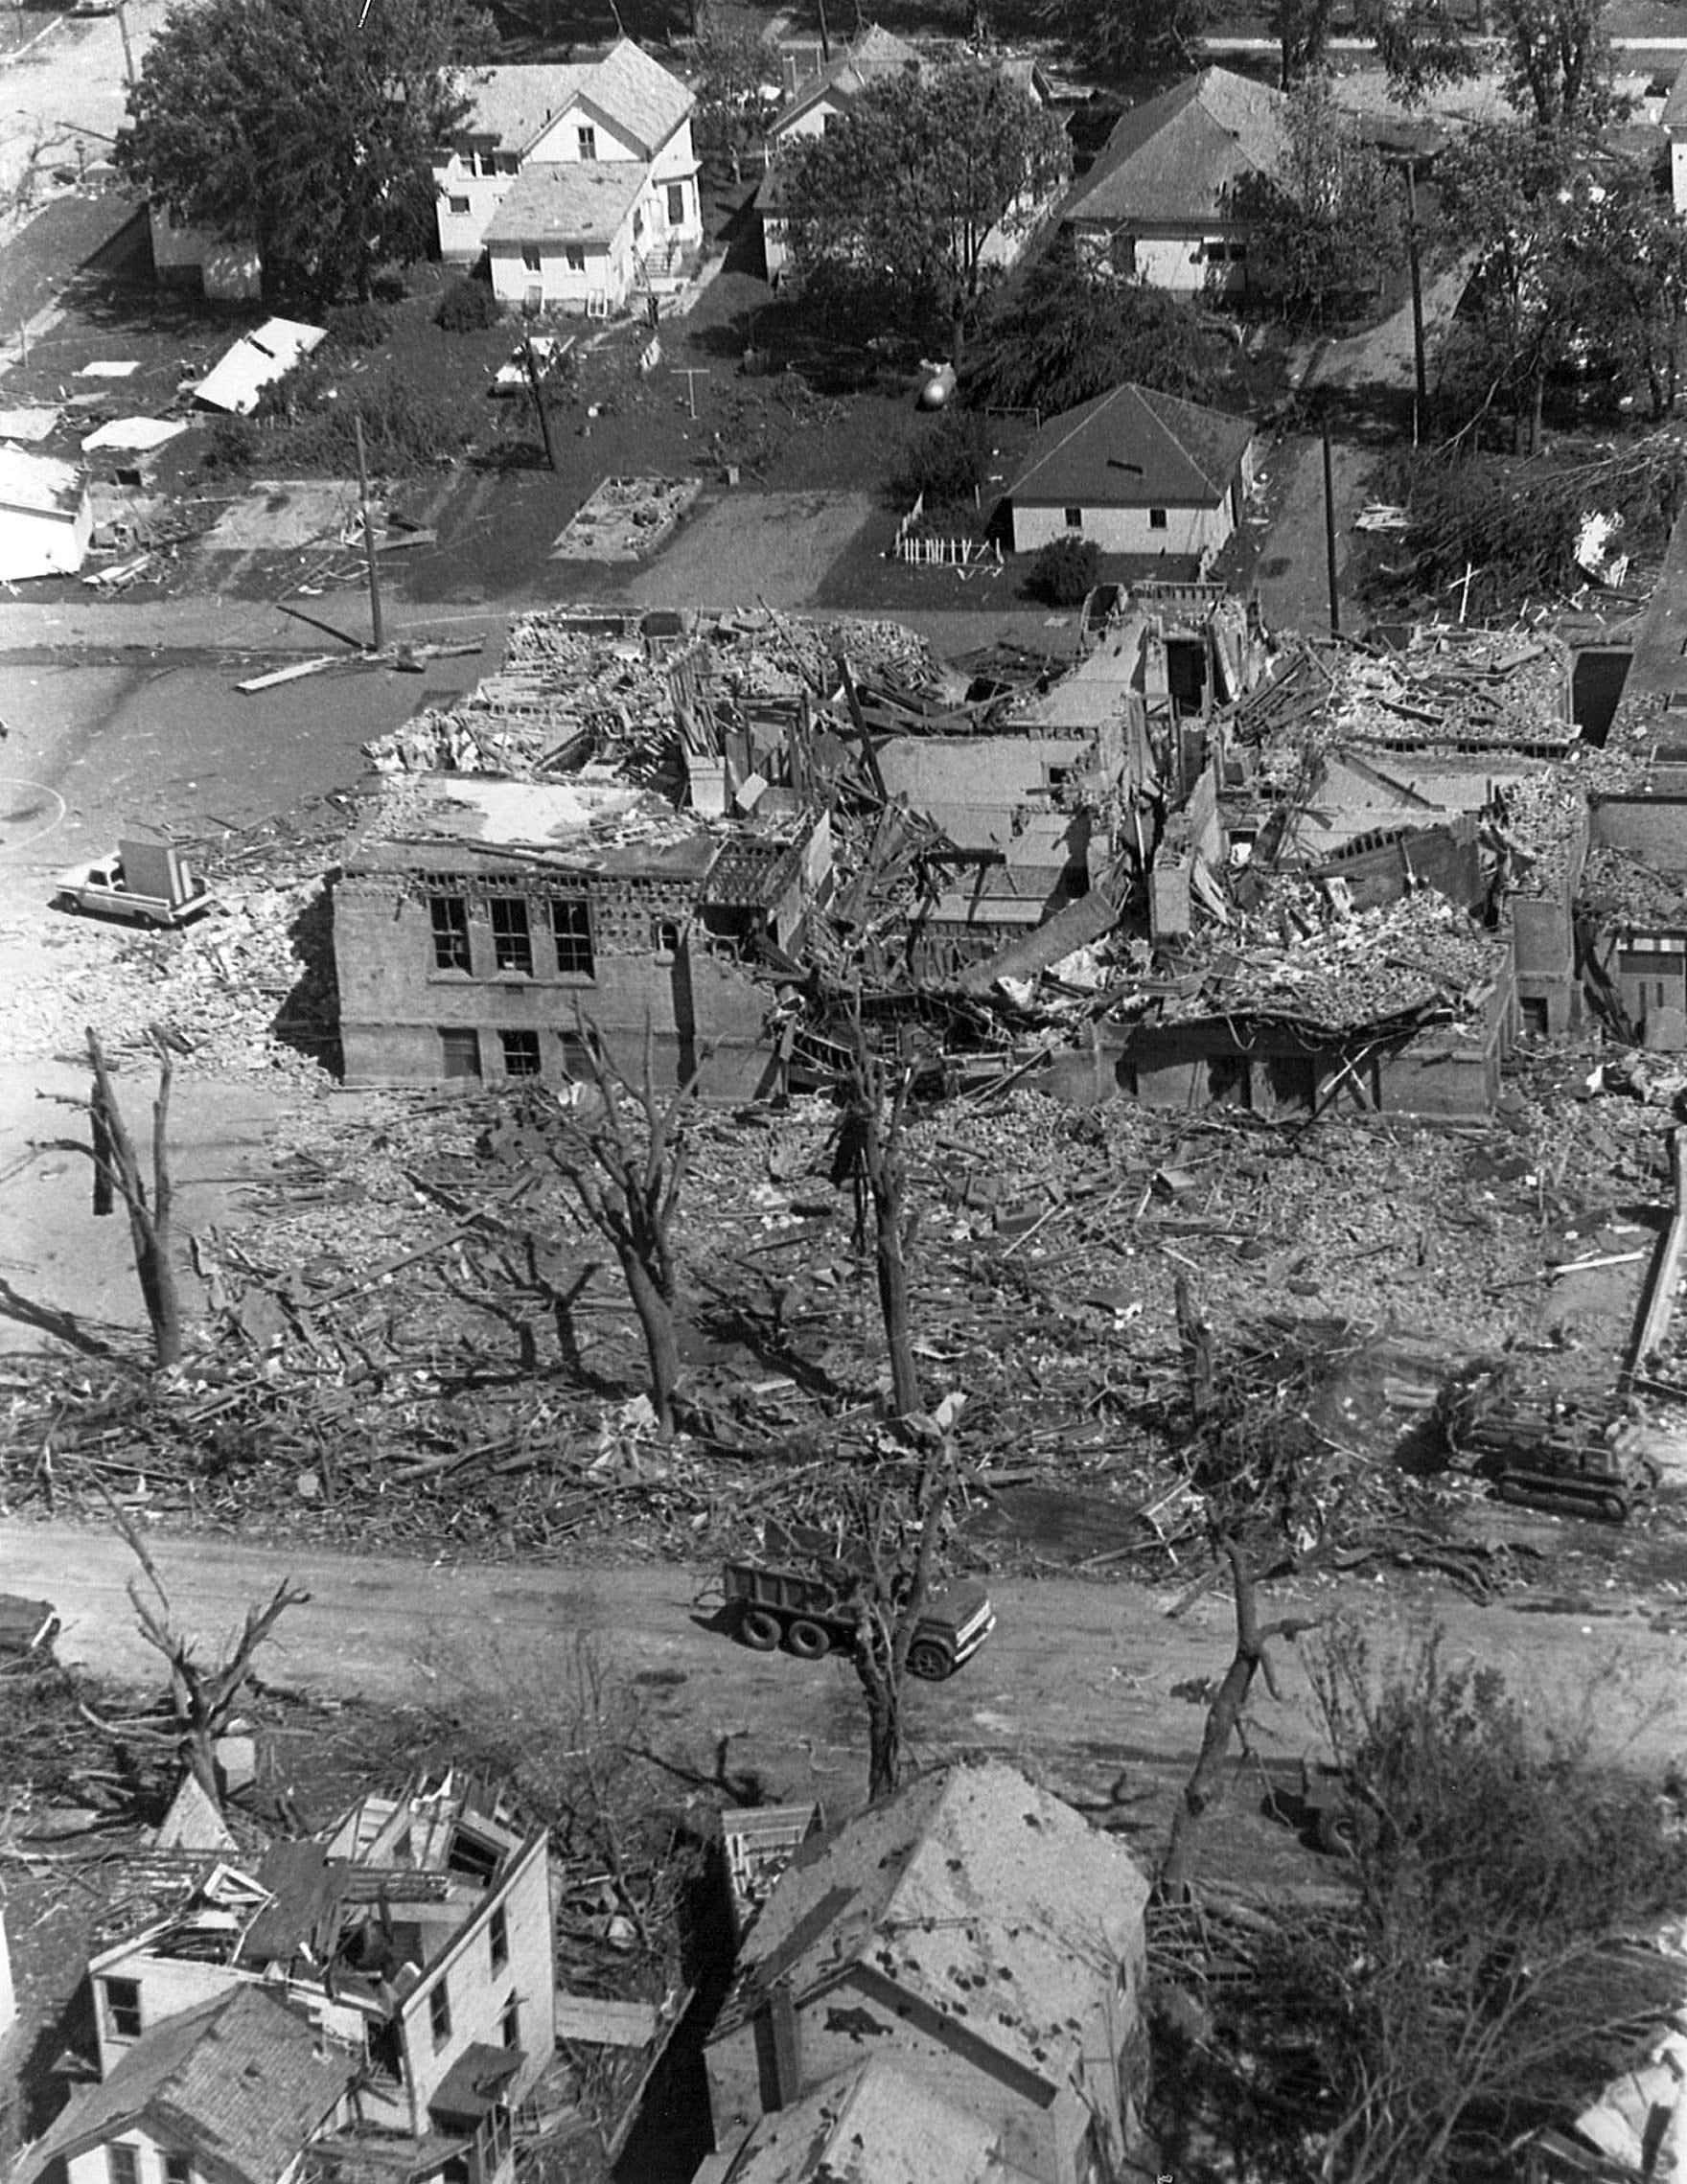 On June 13, 1968, a tornado struck Tracy, Minn.